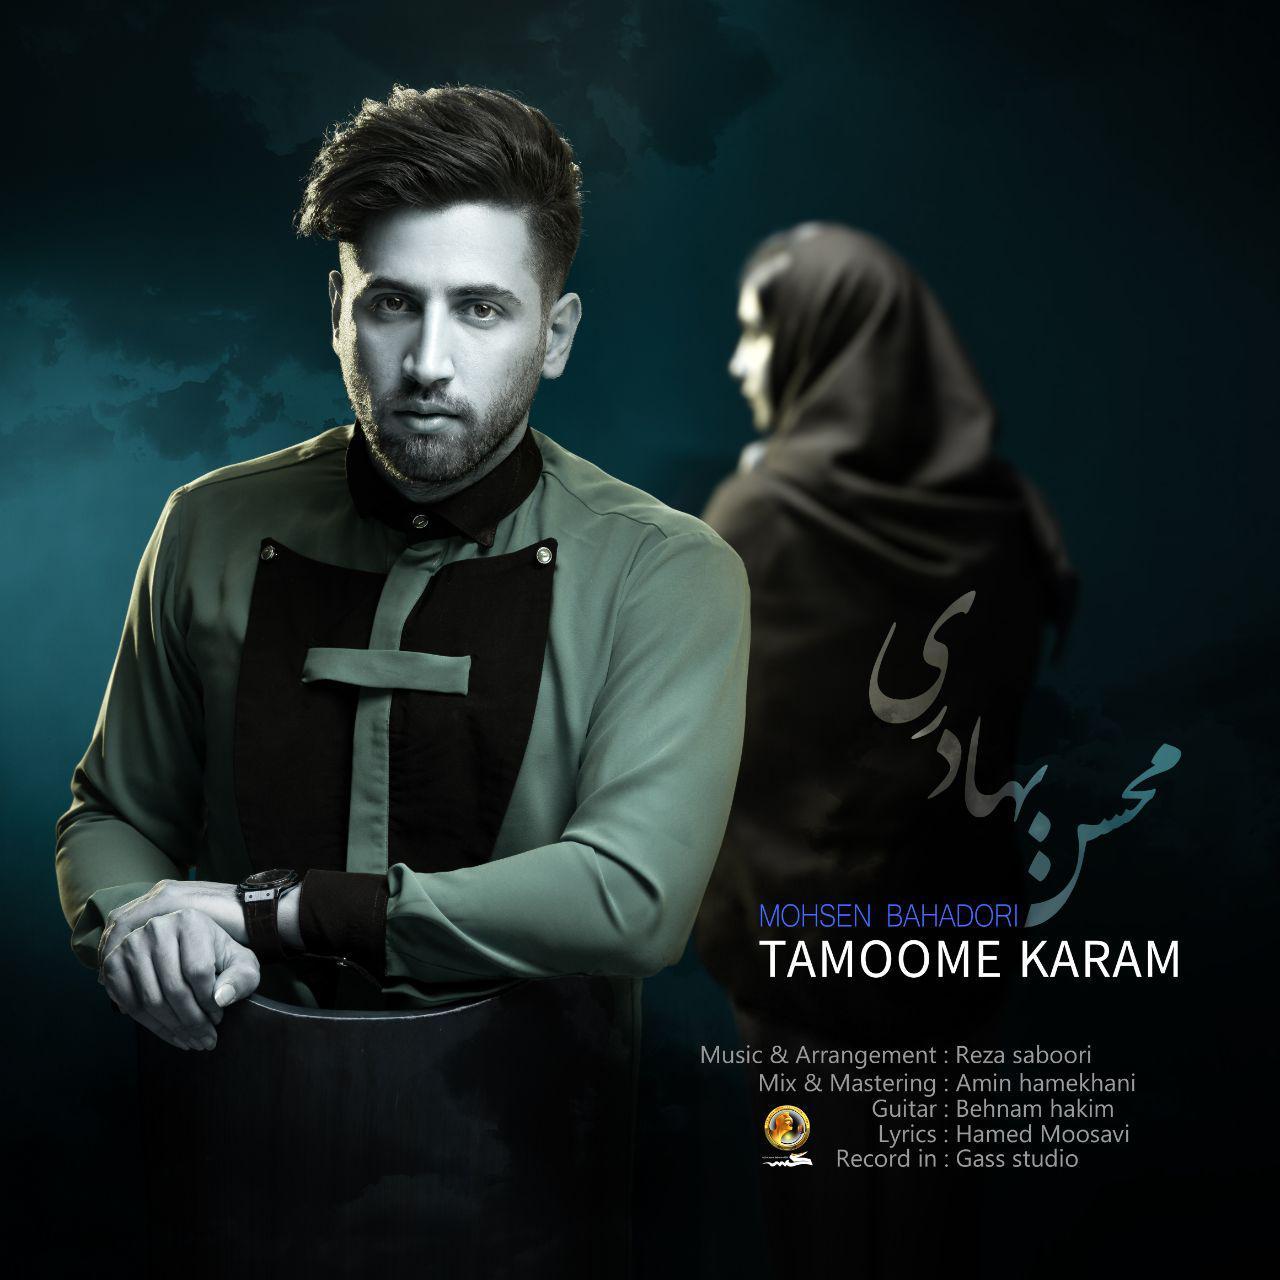 Mohsen Bahadori – Tamoome Karam